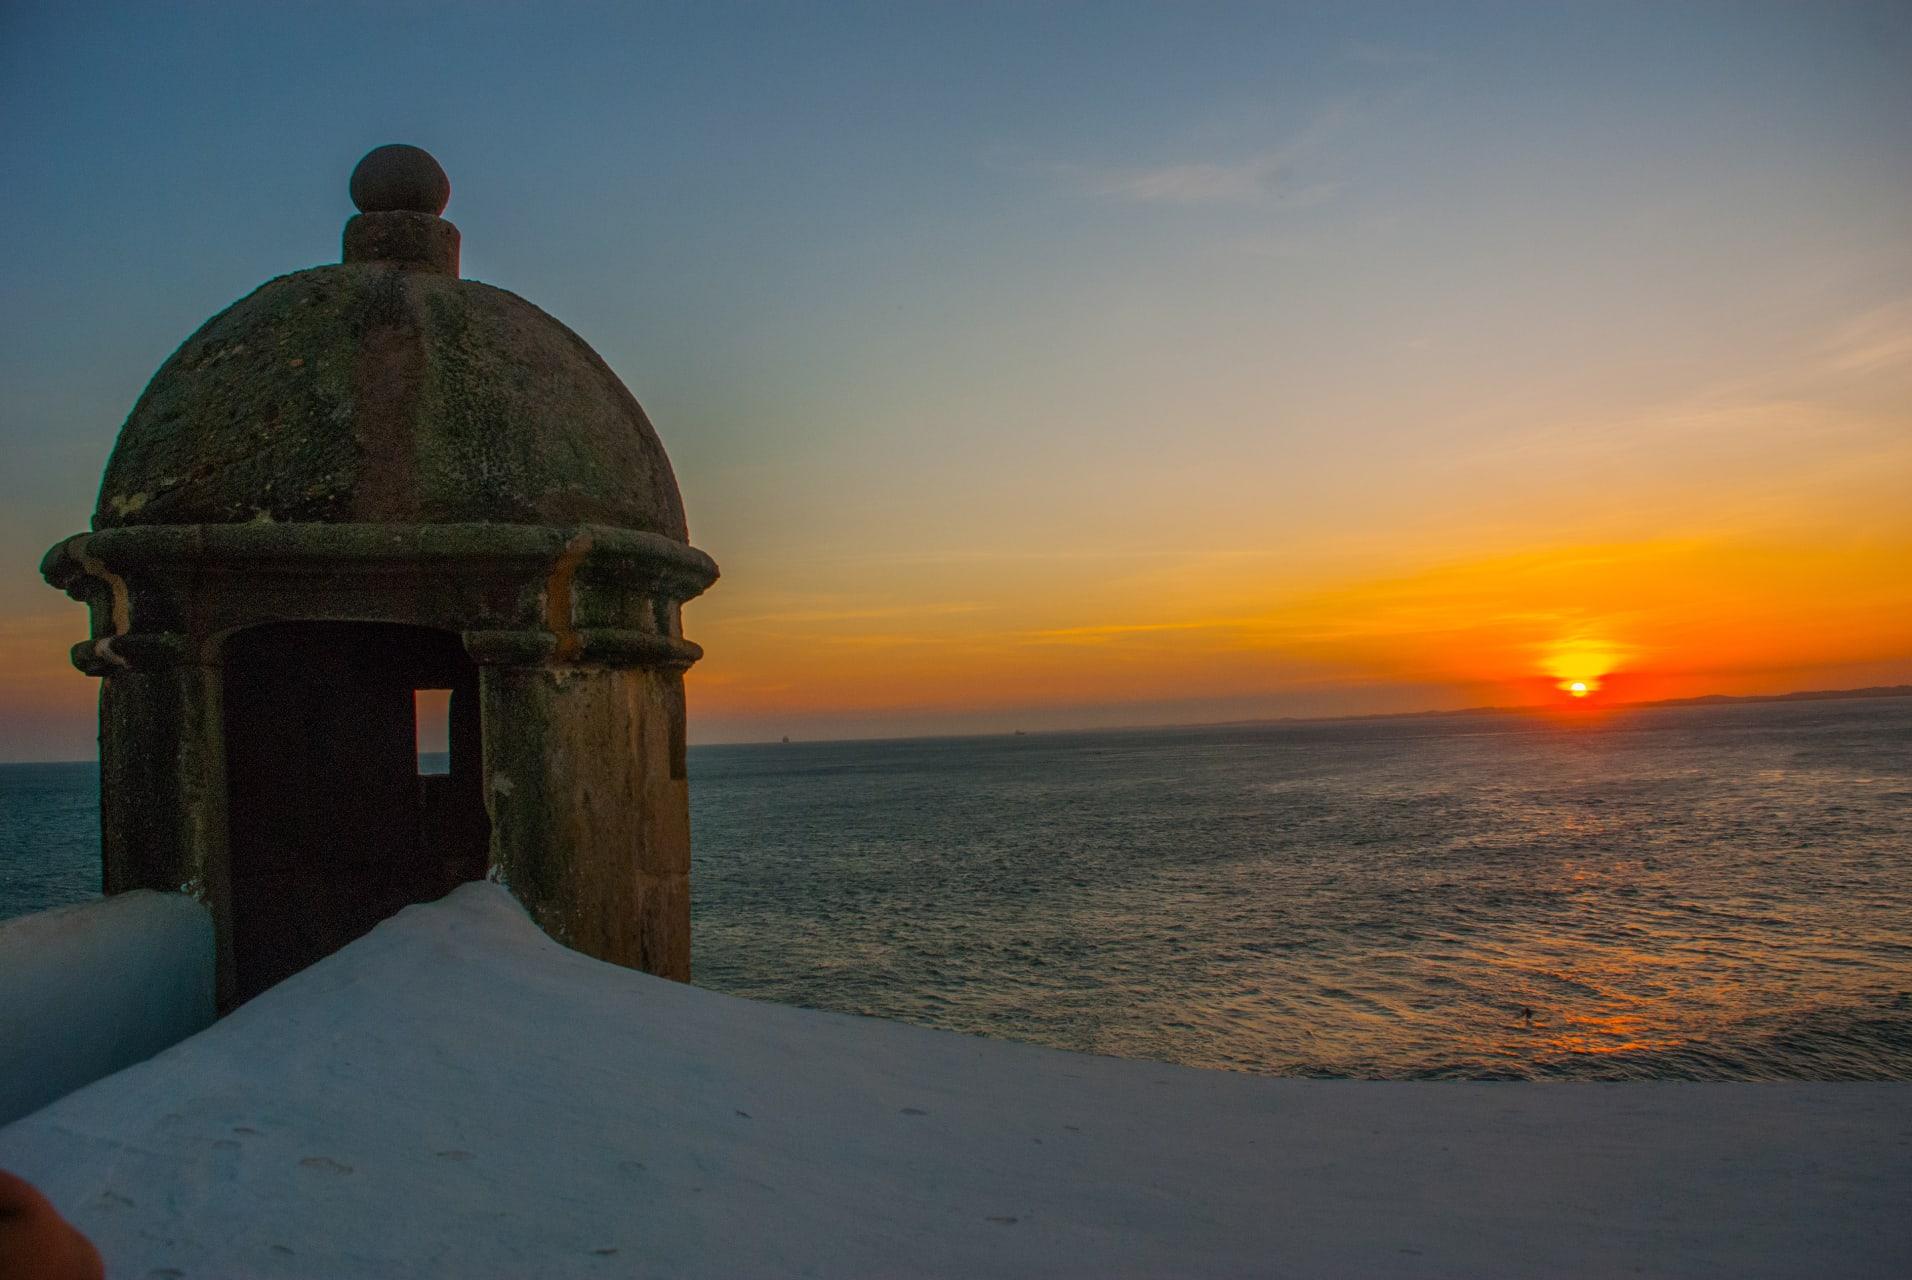 Salvador Bahia - Sunset Views in Bahia: Relaxing by the ocean